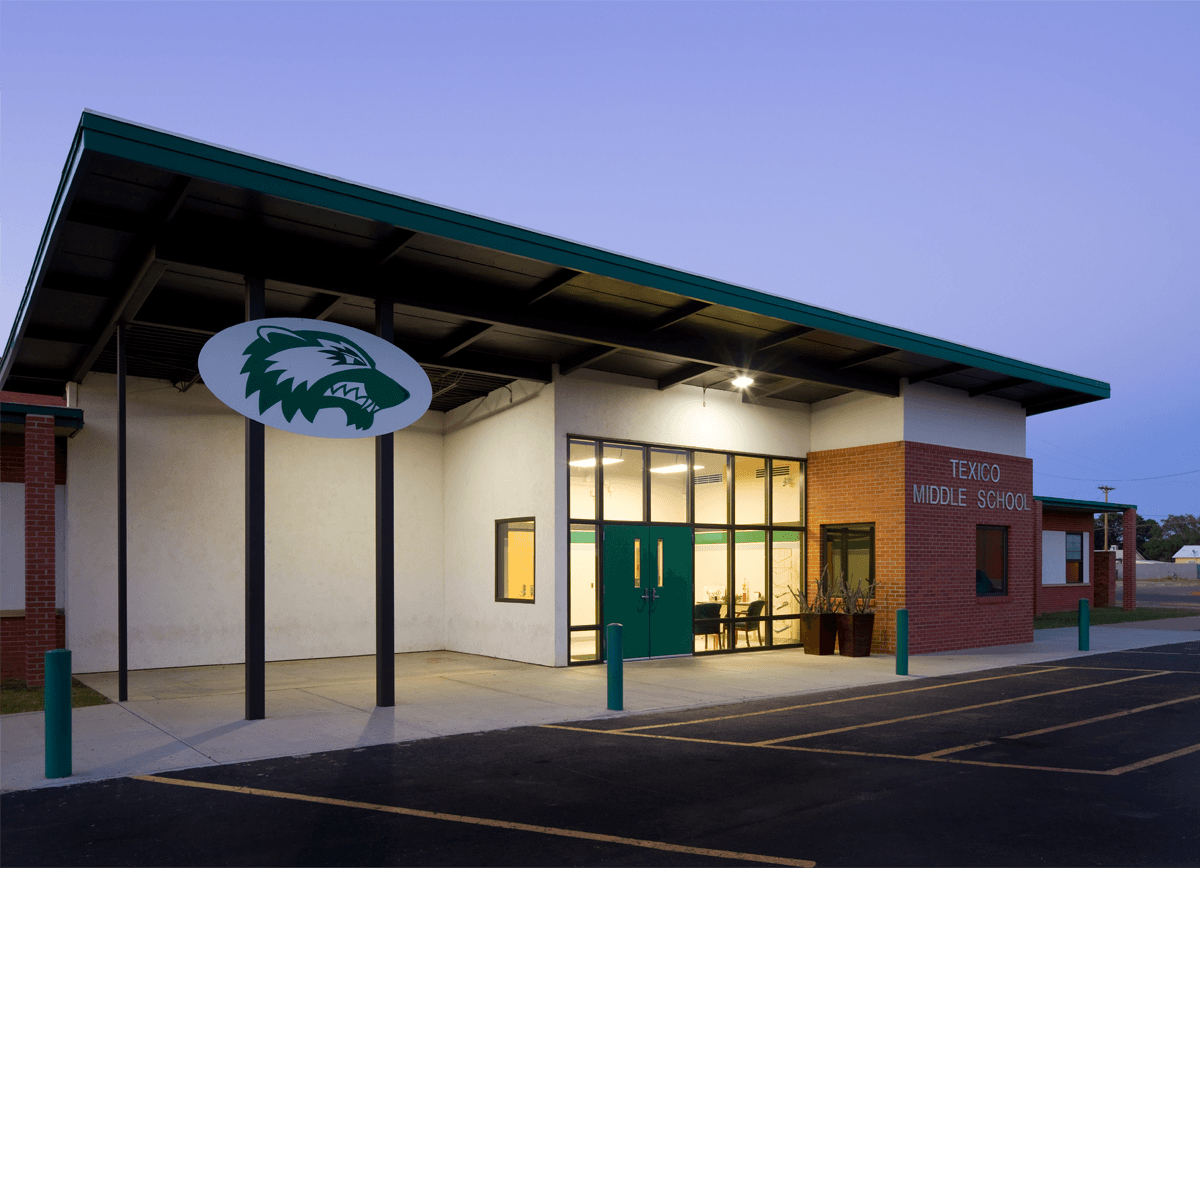 Texico Middle School